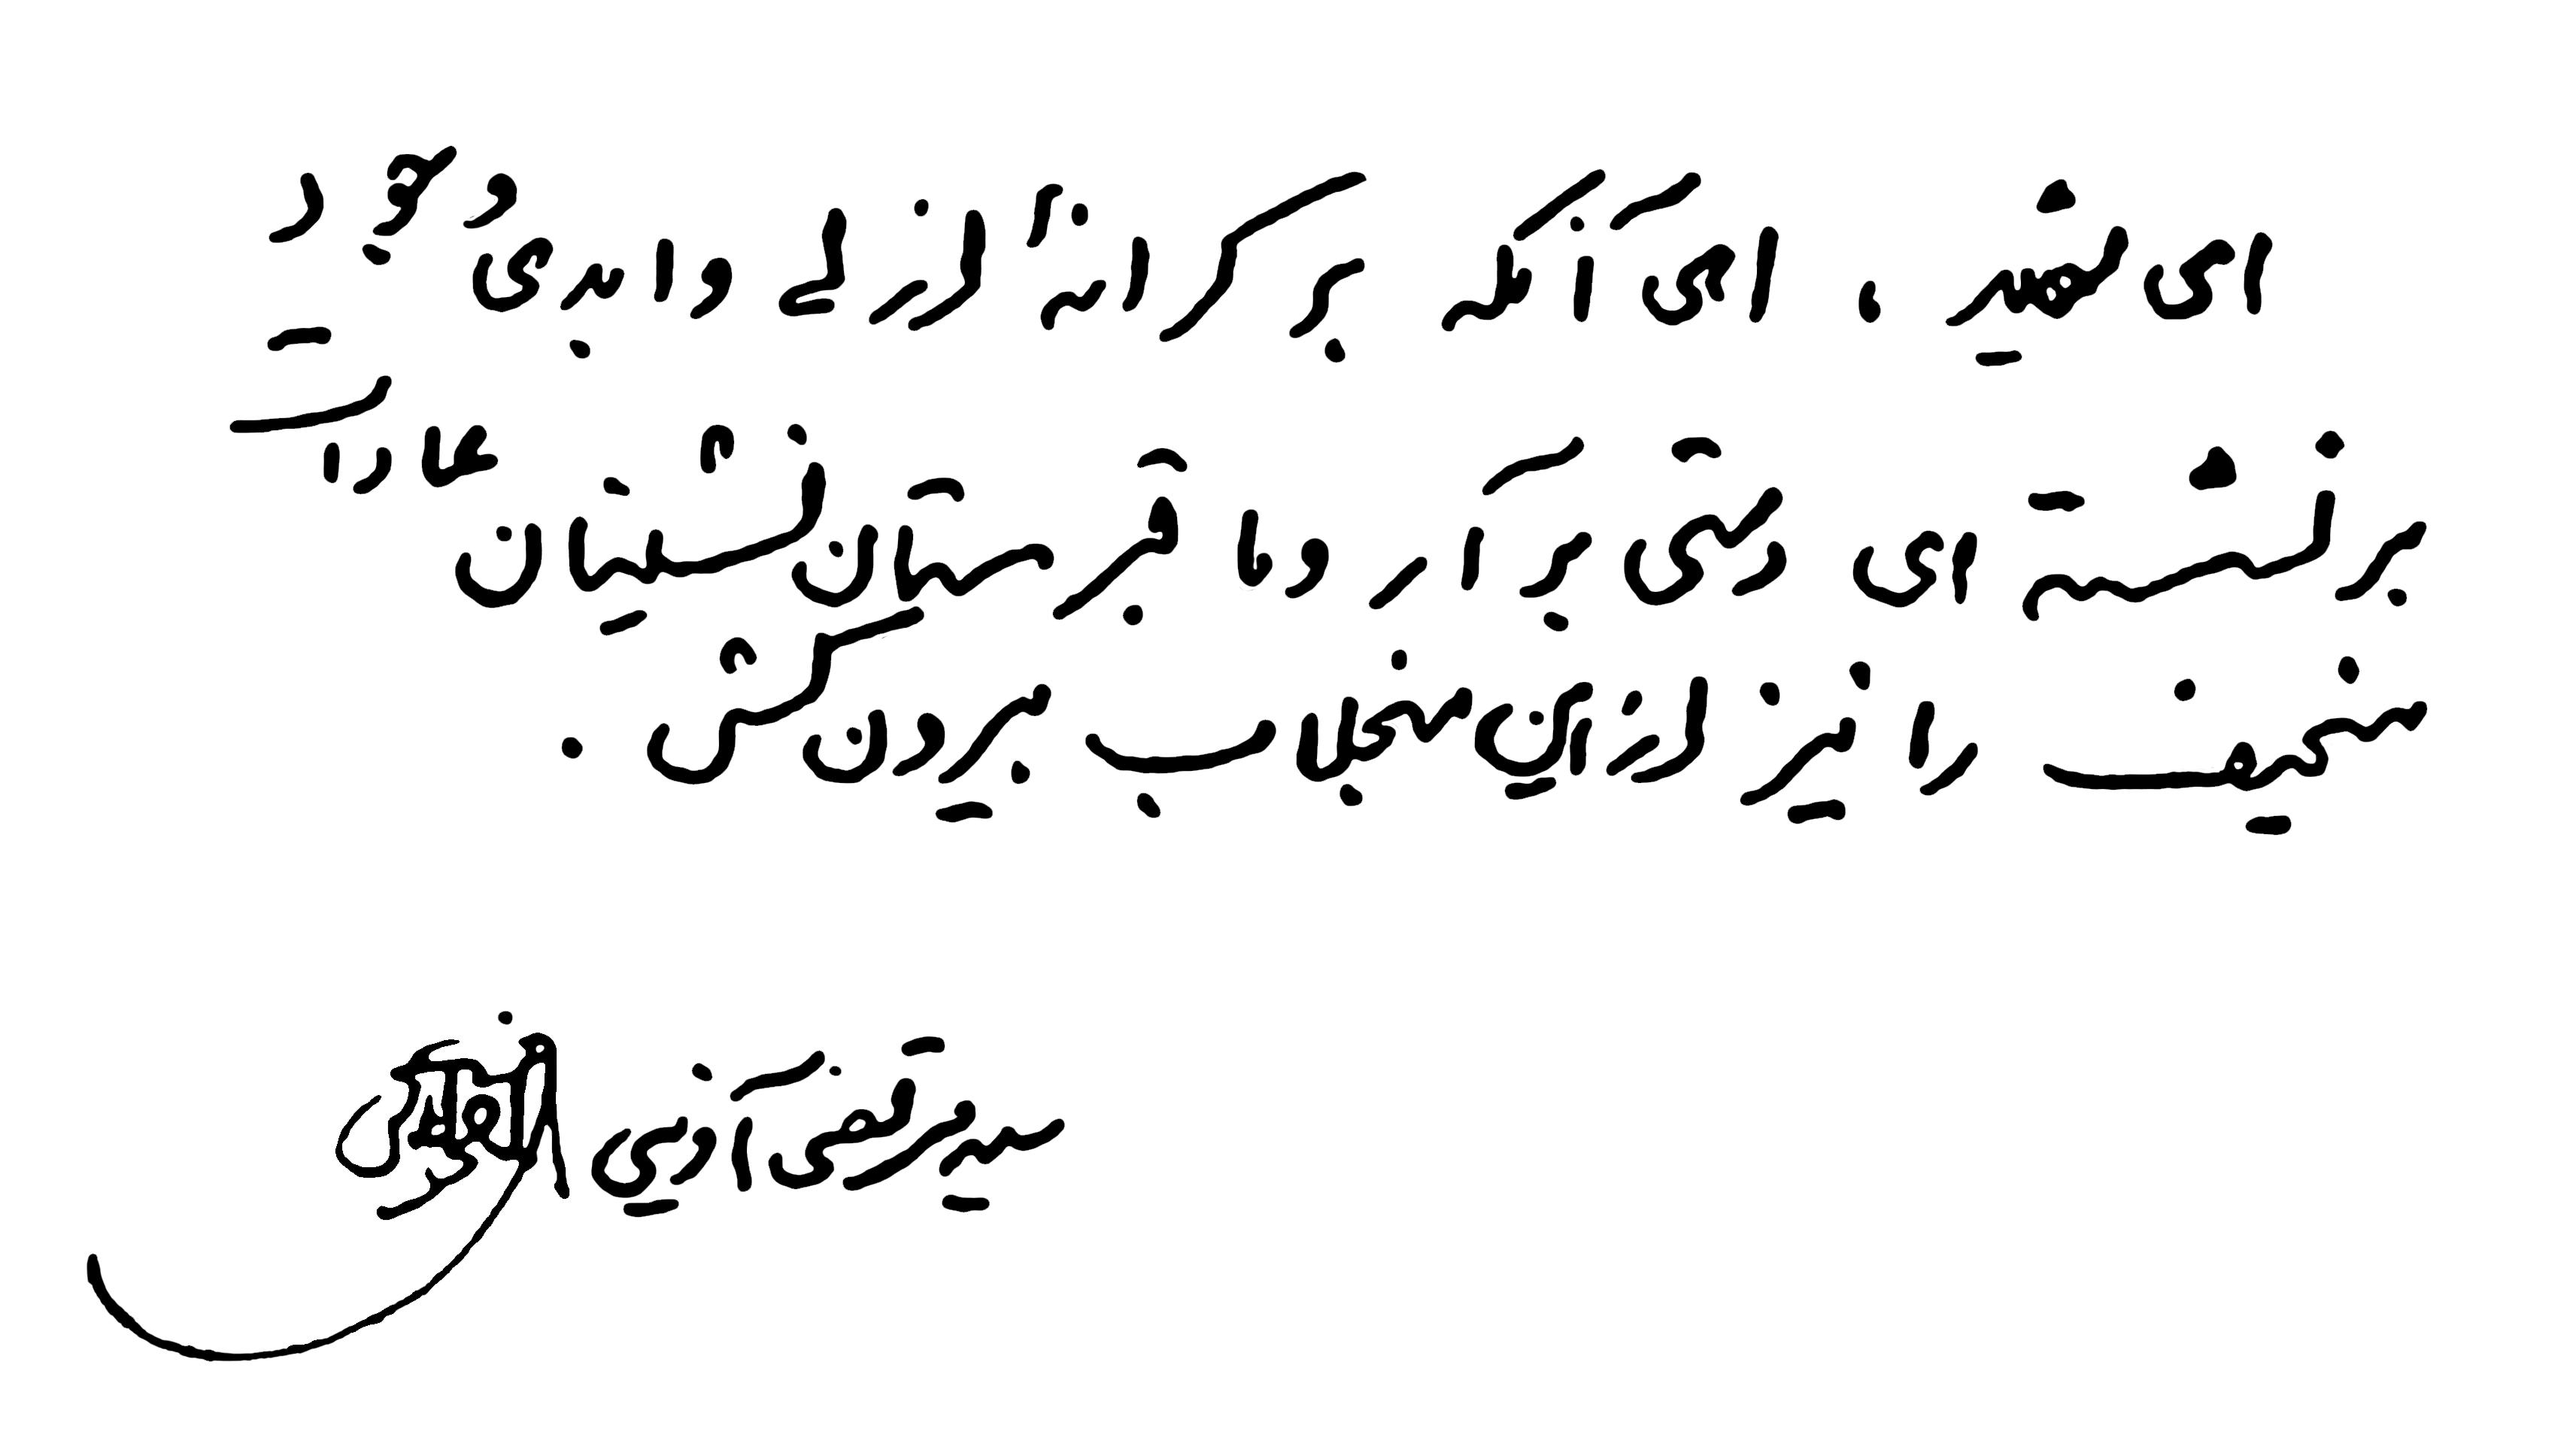 http://dl.aviny.com/Album/defa-moghadas/Shakhes/aviny/DAST_NEVESHTEH/kamel/11.png